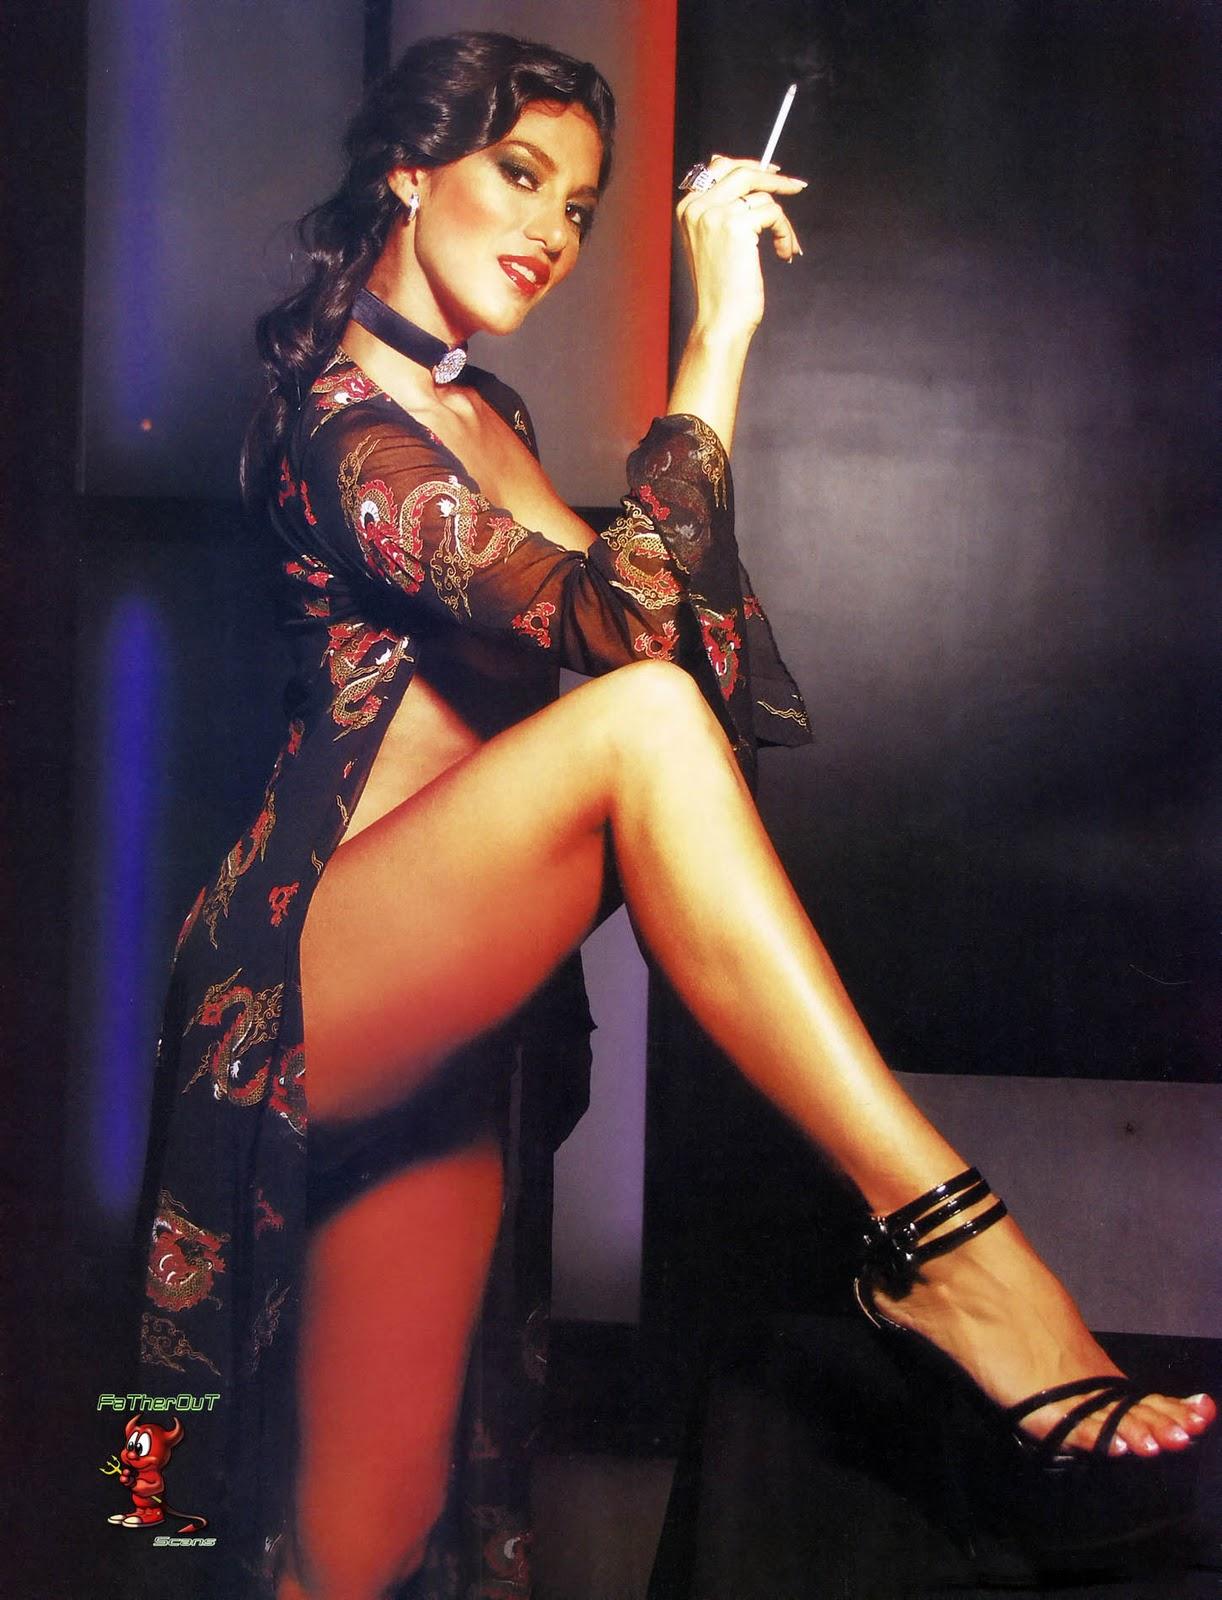 http://1.bp.blogspot.com/_2DrwKI9DpLs/TRqVZ98os3I/AAAAAAAAAr0/Xa9T8lN47Vg/s1600/88235_Silvina-Escudero-02K-Playboy-jun-2009_123_108lo.jpg